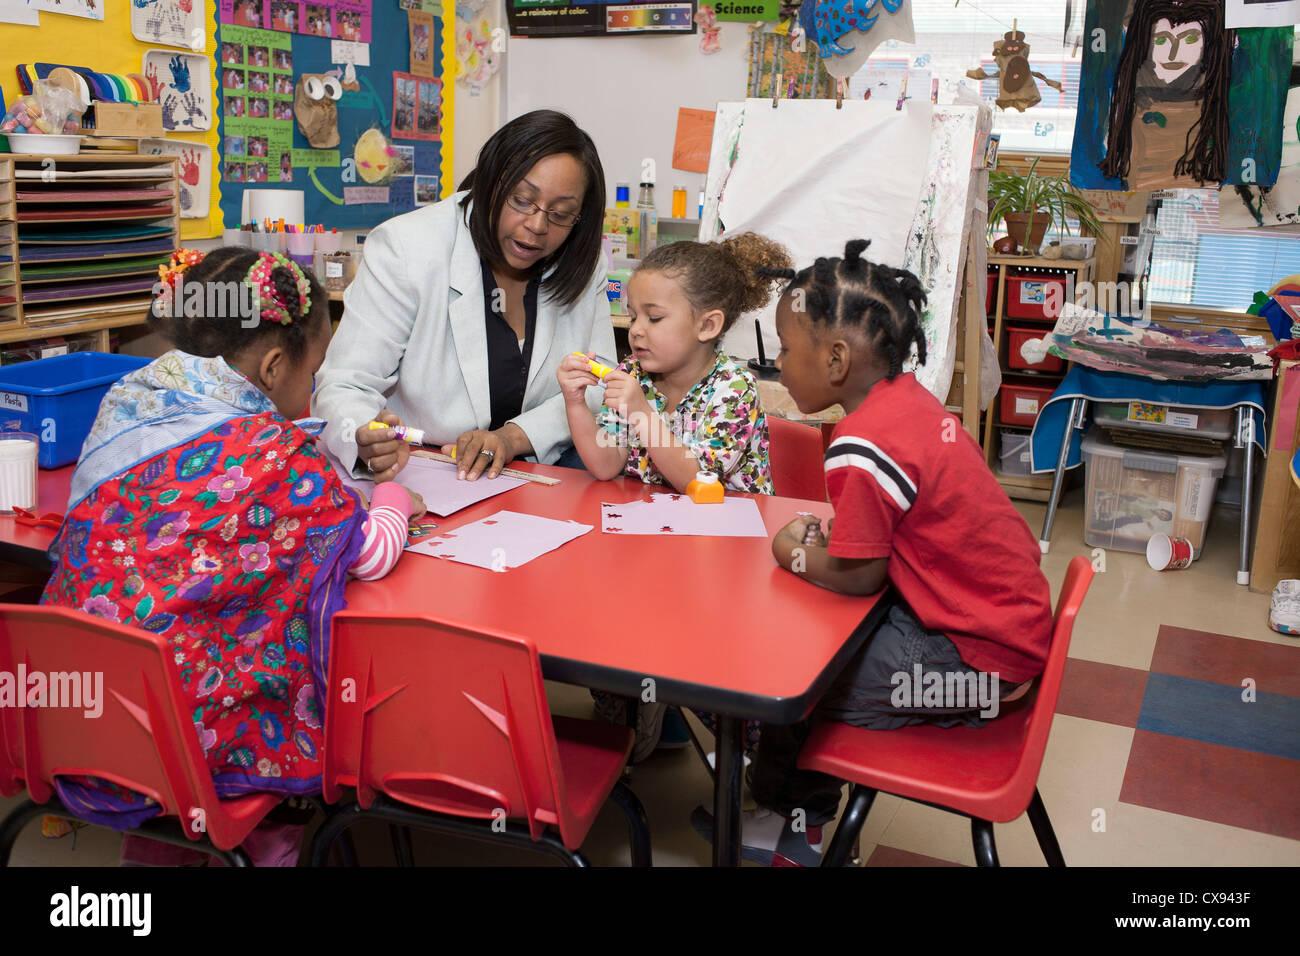 Female African American Preschool Teacher Drawing With